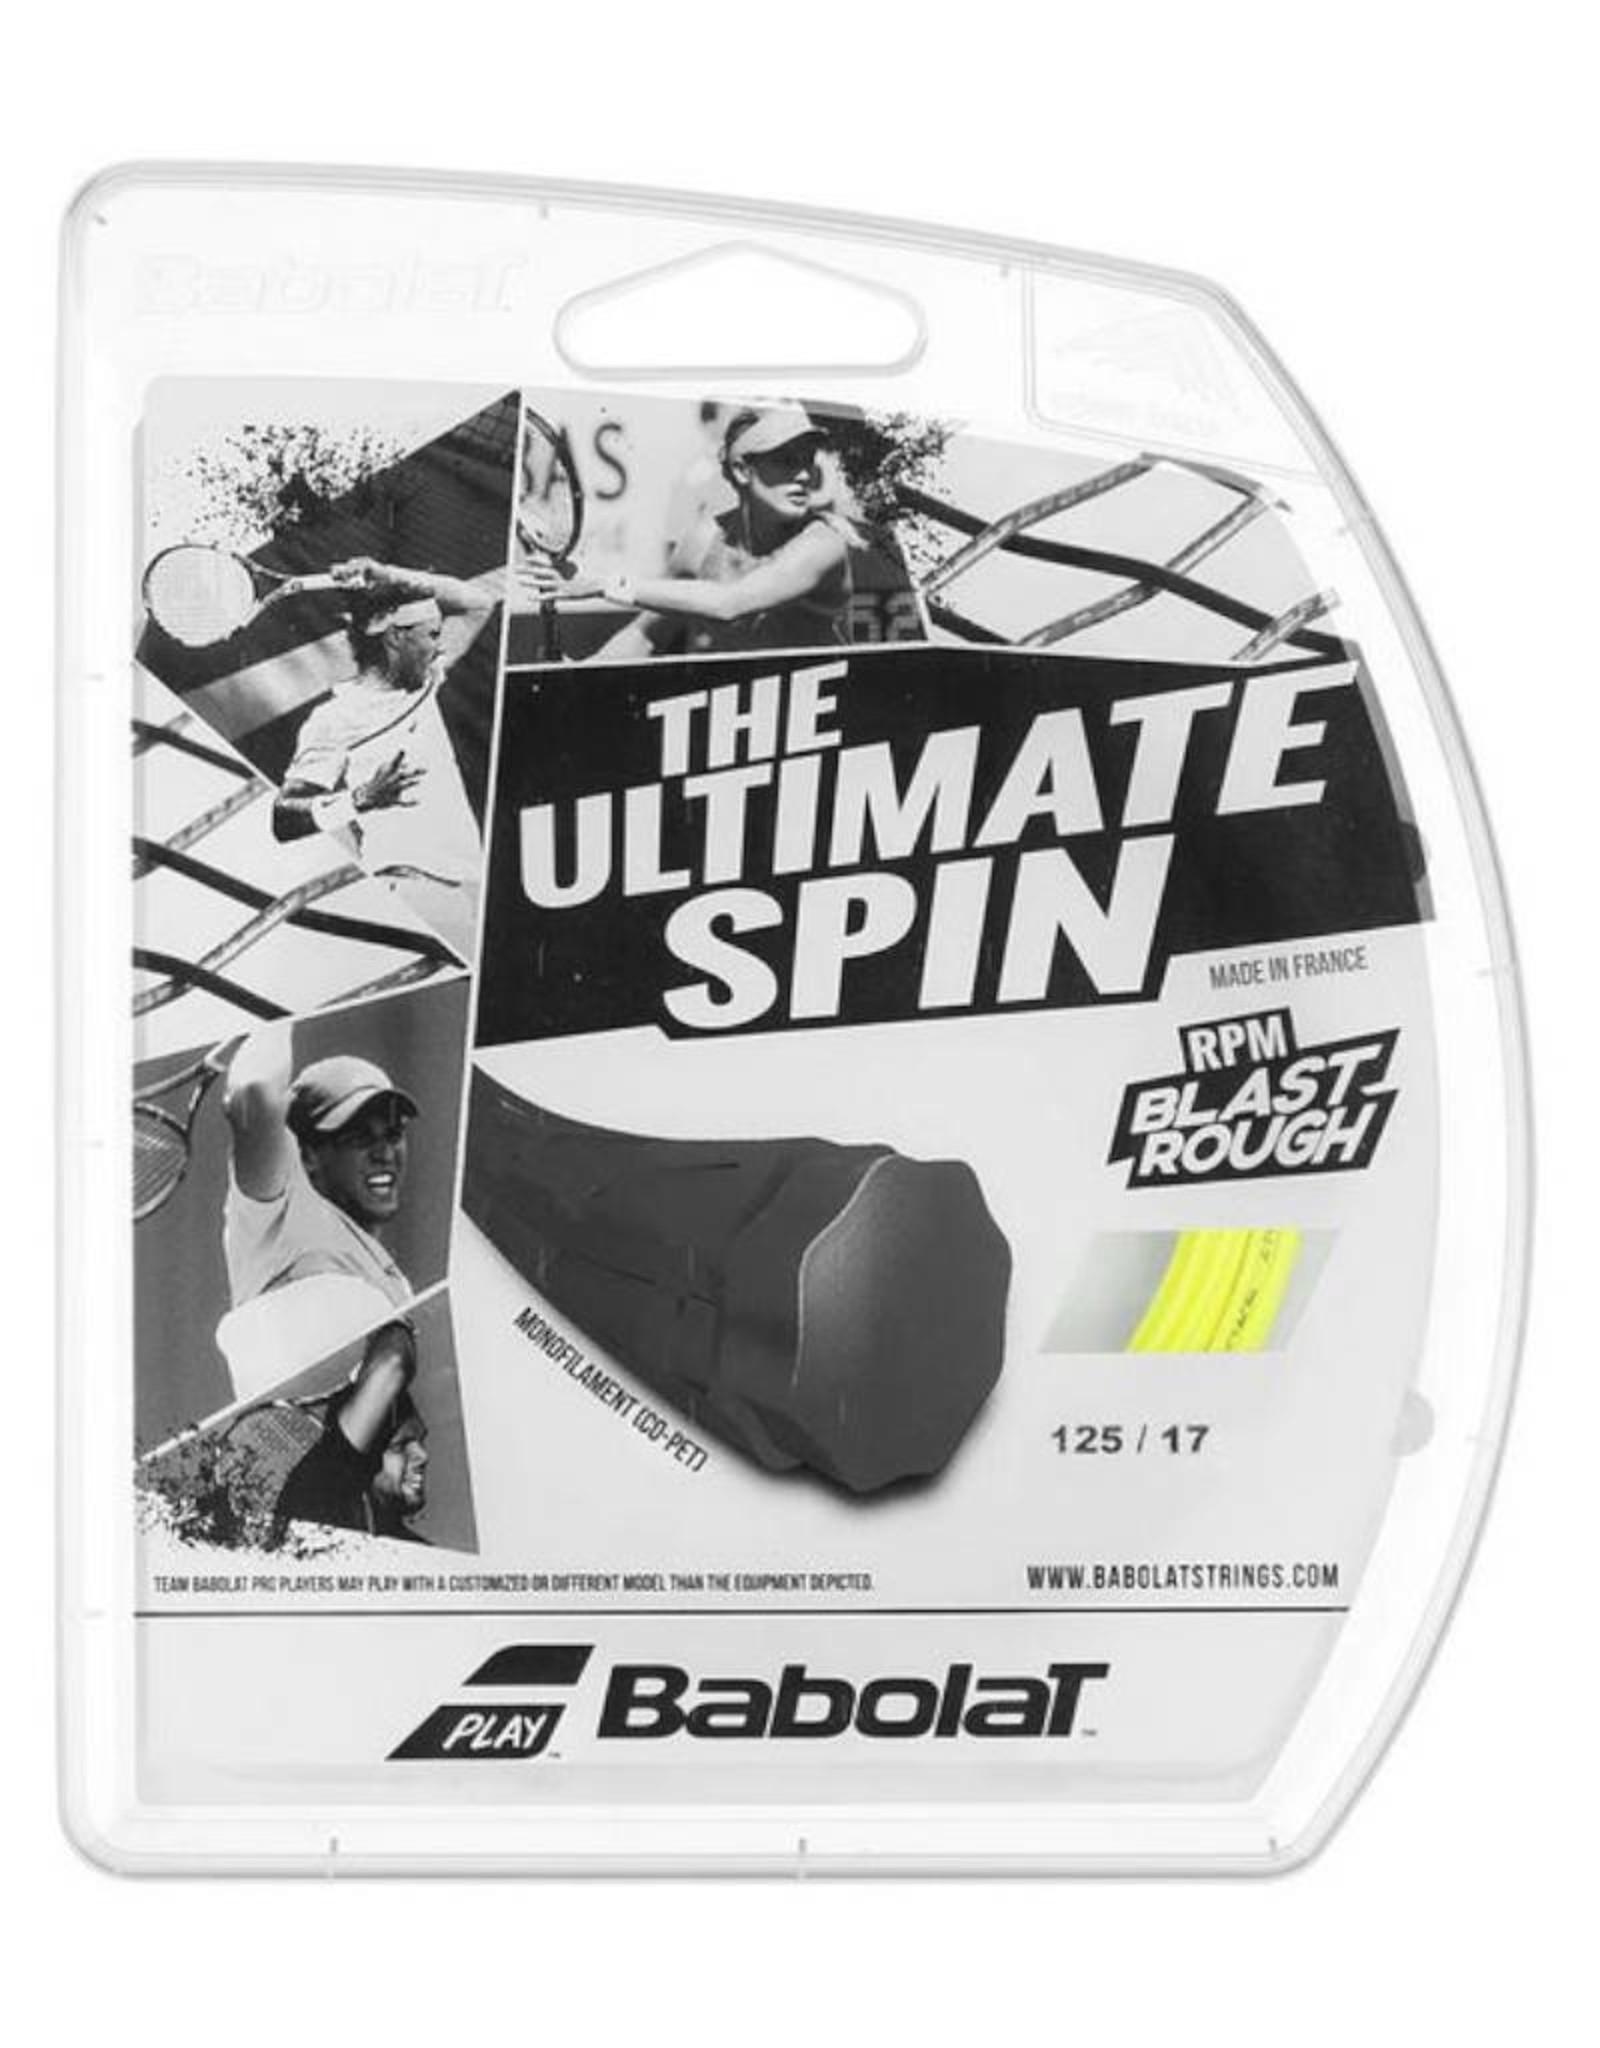 BABOLAT RPM BLAST ROUGH 17 FULL SET (YELLOW)